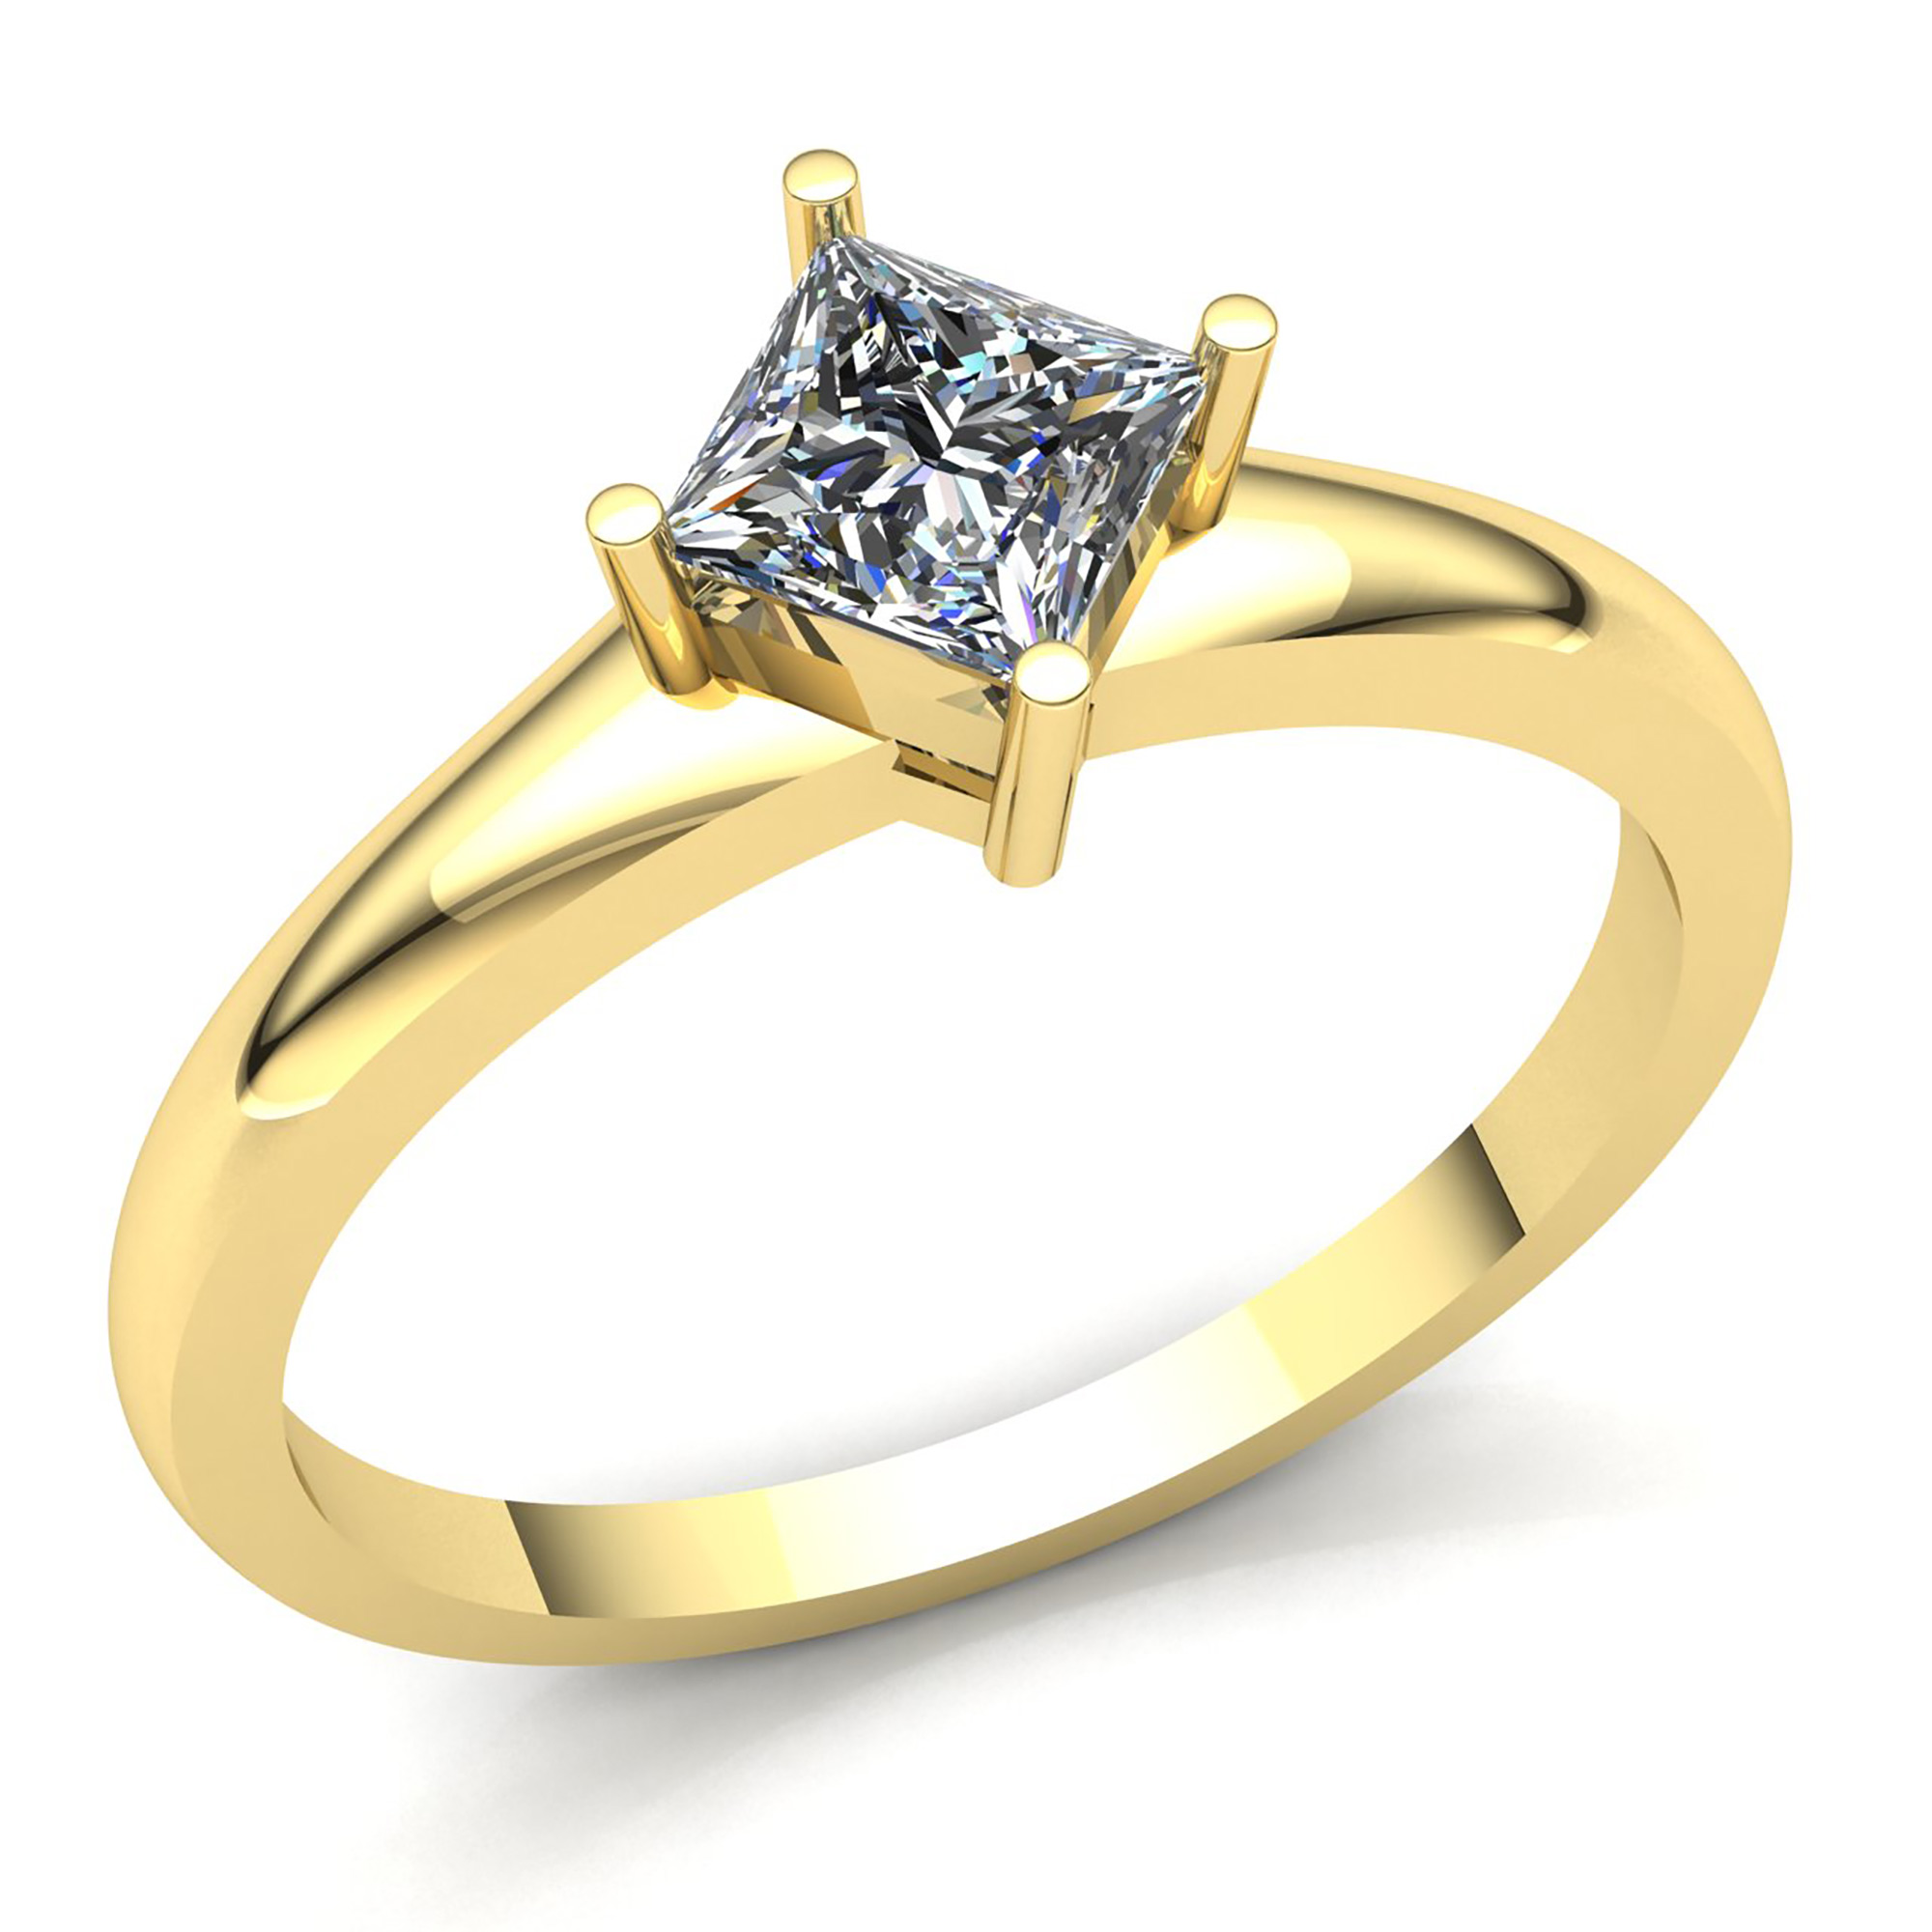 Mens Diamond Rings Ebay Uk